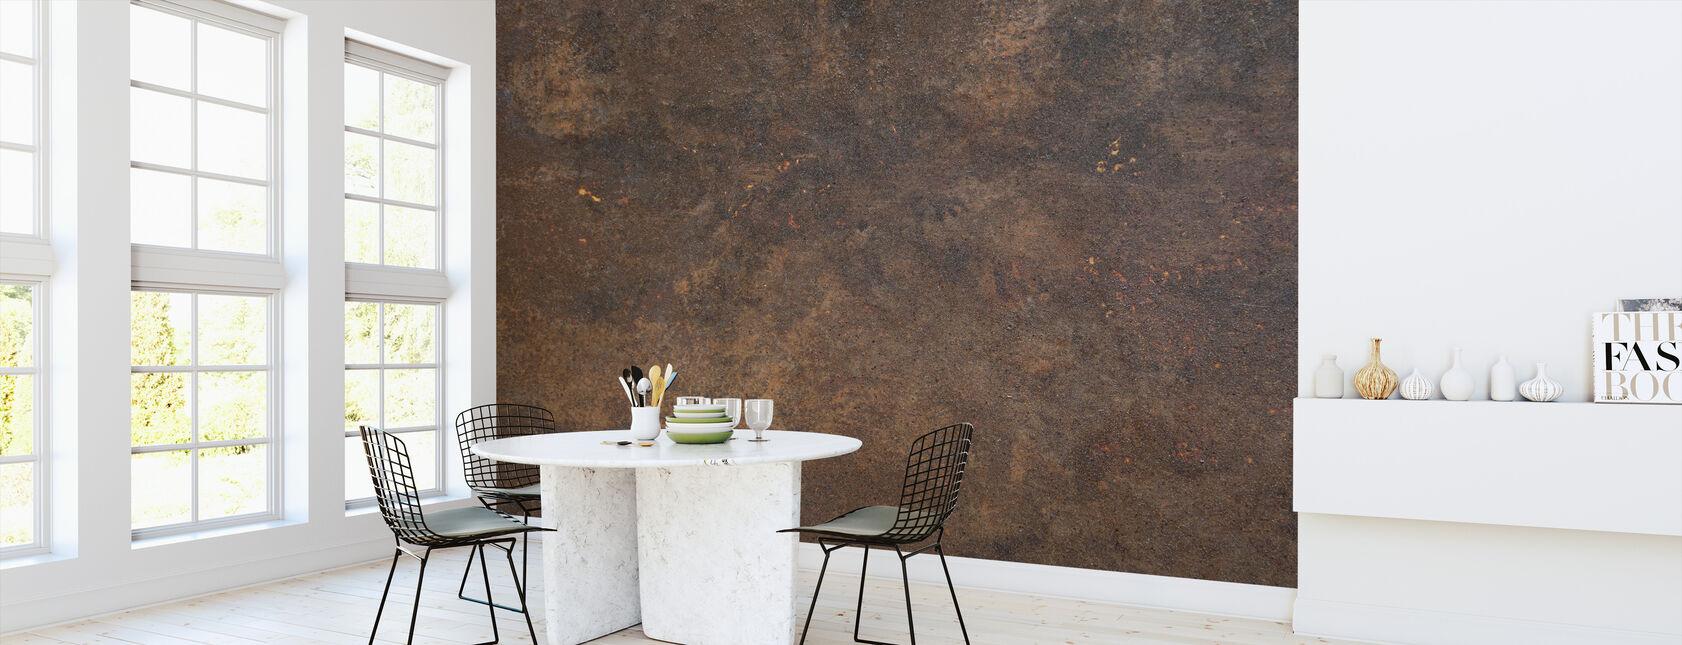 Rusten tekstur - Tapet - Køkken